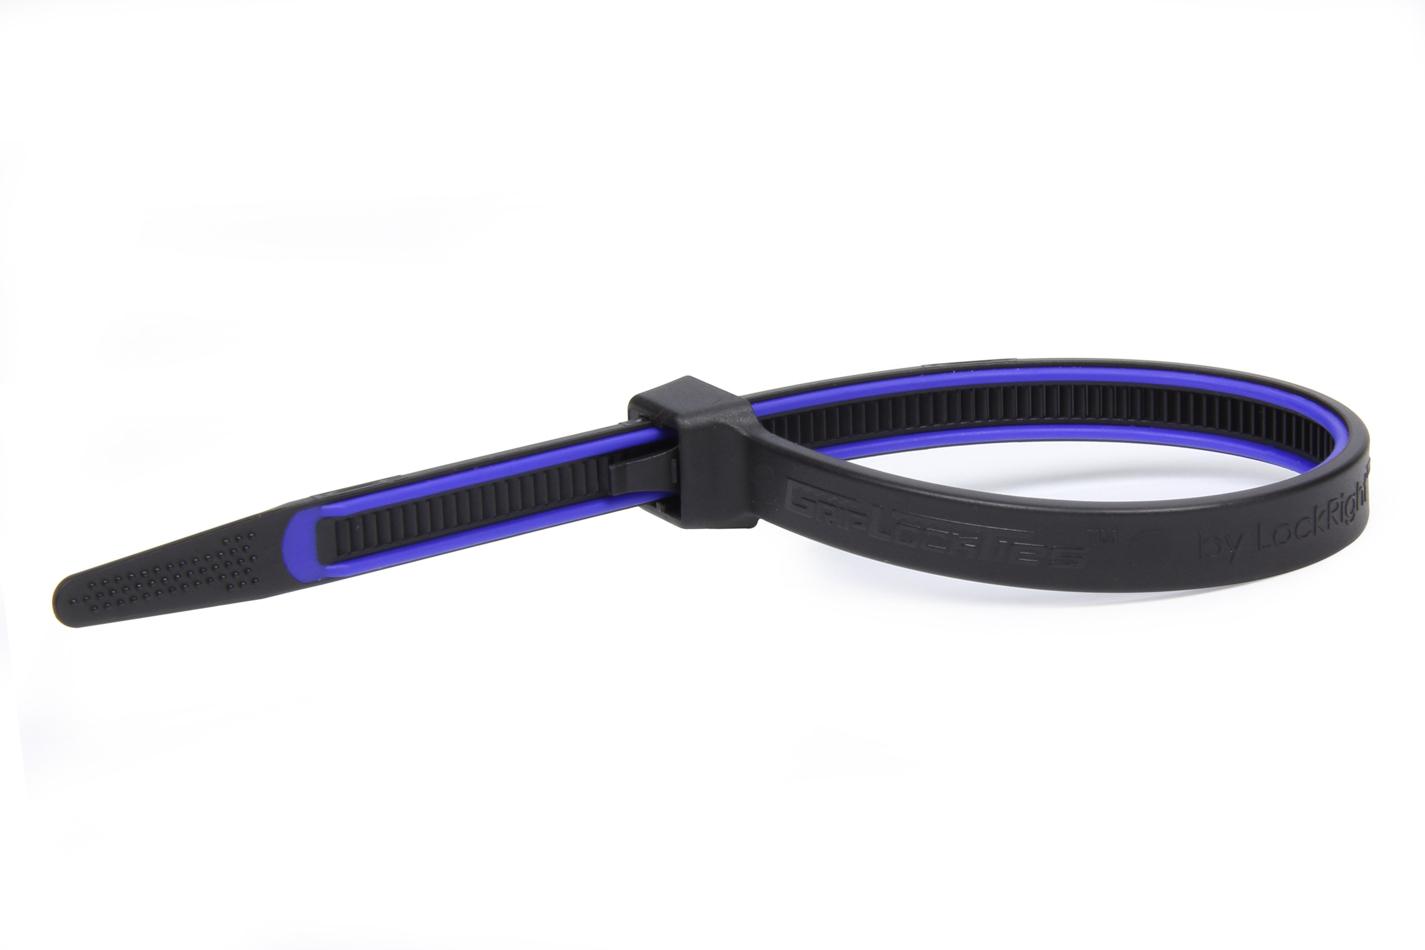 Grip Lock Ties 2908BKBUHB100 Cable Ties, Zip Ties, 8 in Long, Blue Rubber Lined, Nylon, Black, Reusable, Set of 100